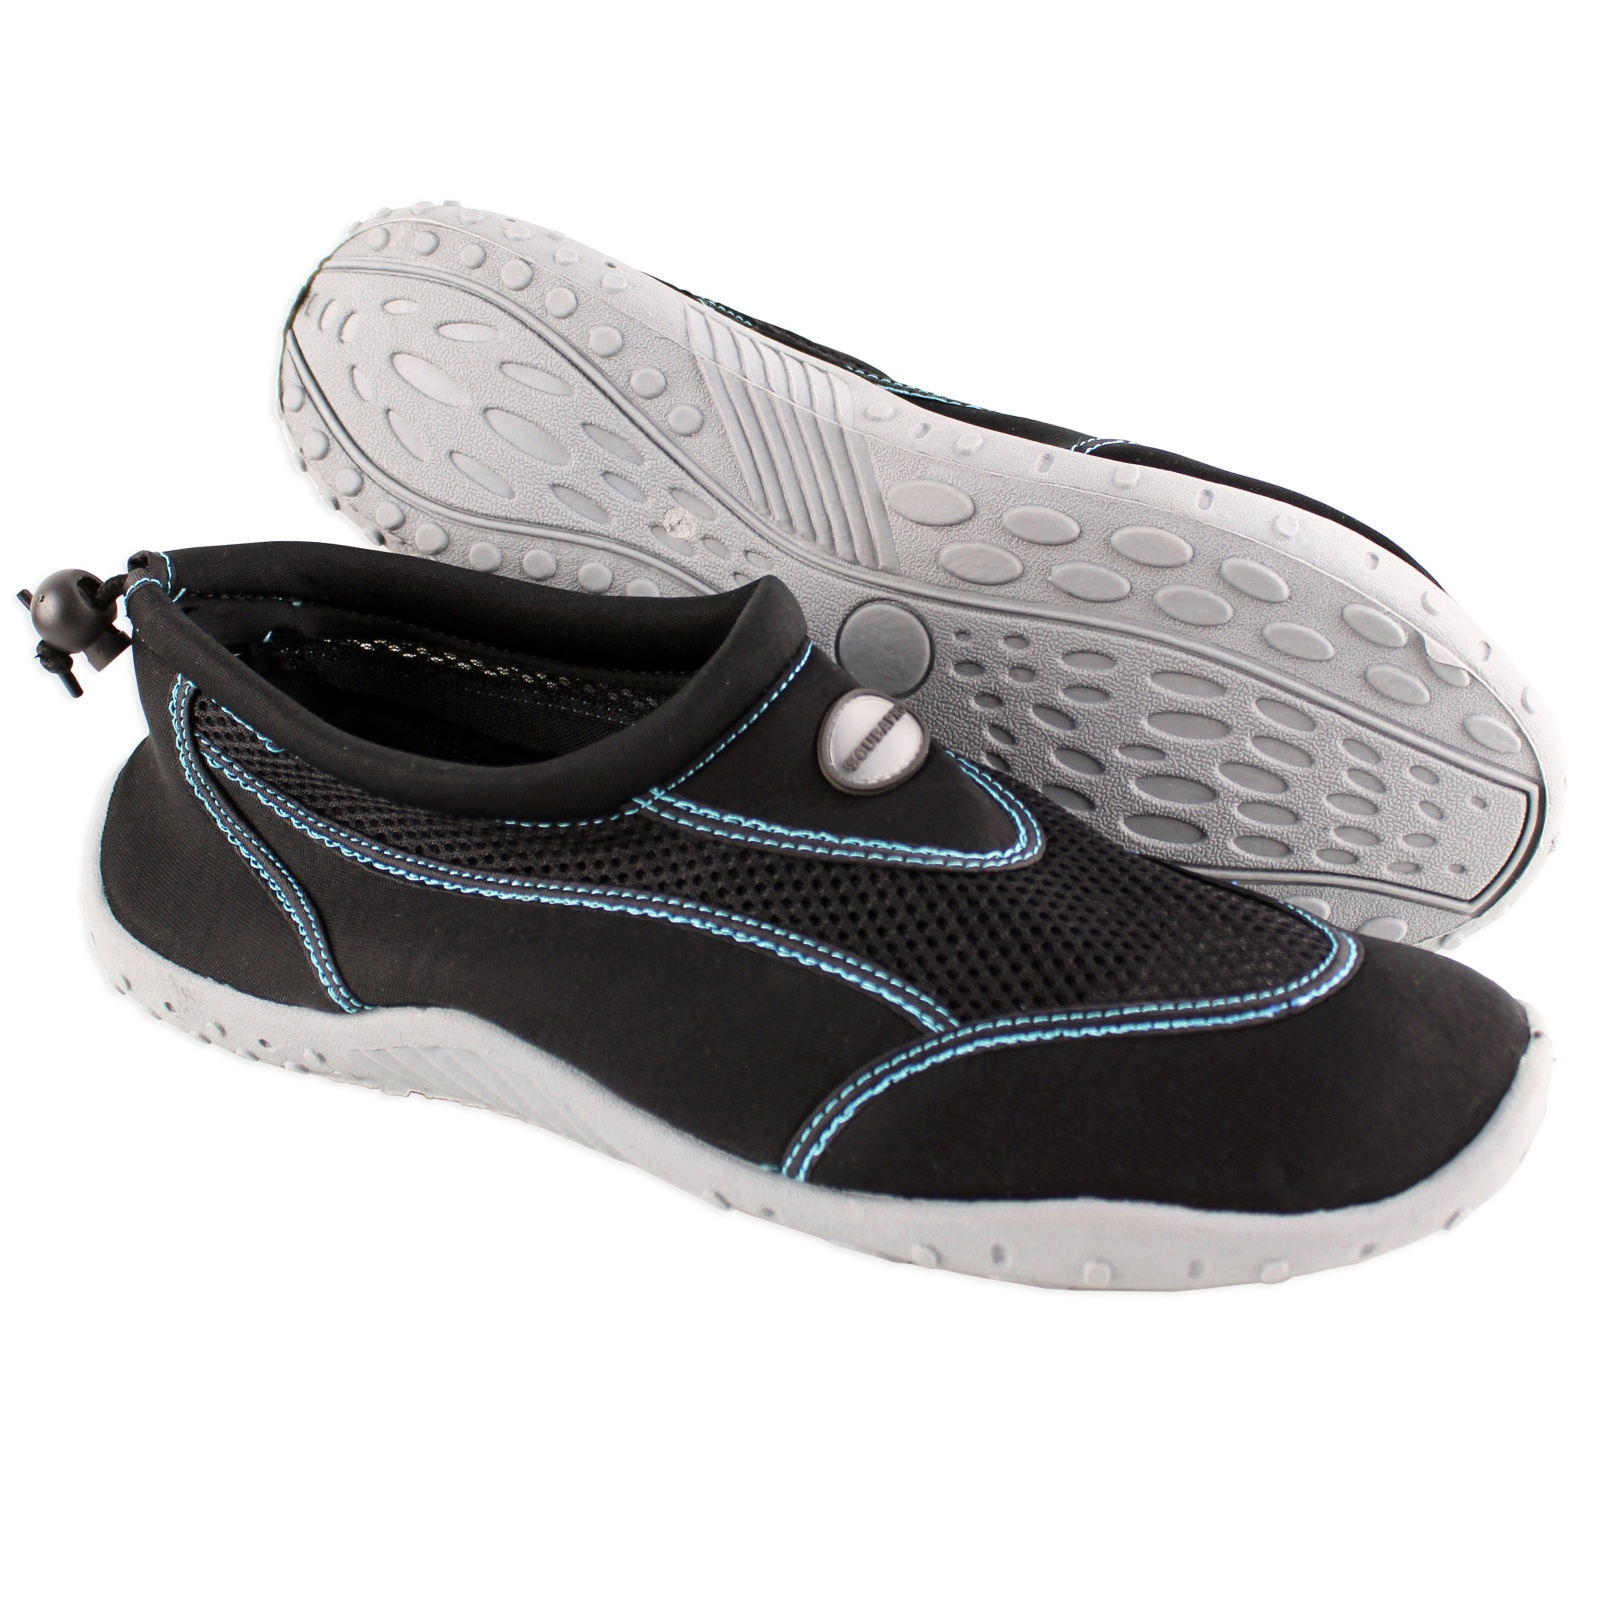 Neoprenové boty SCUBAPRO Kailua - vel. 46